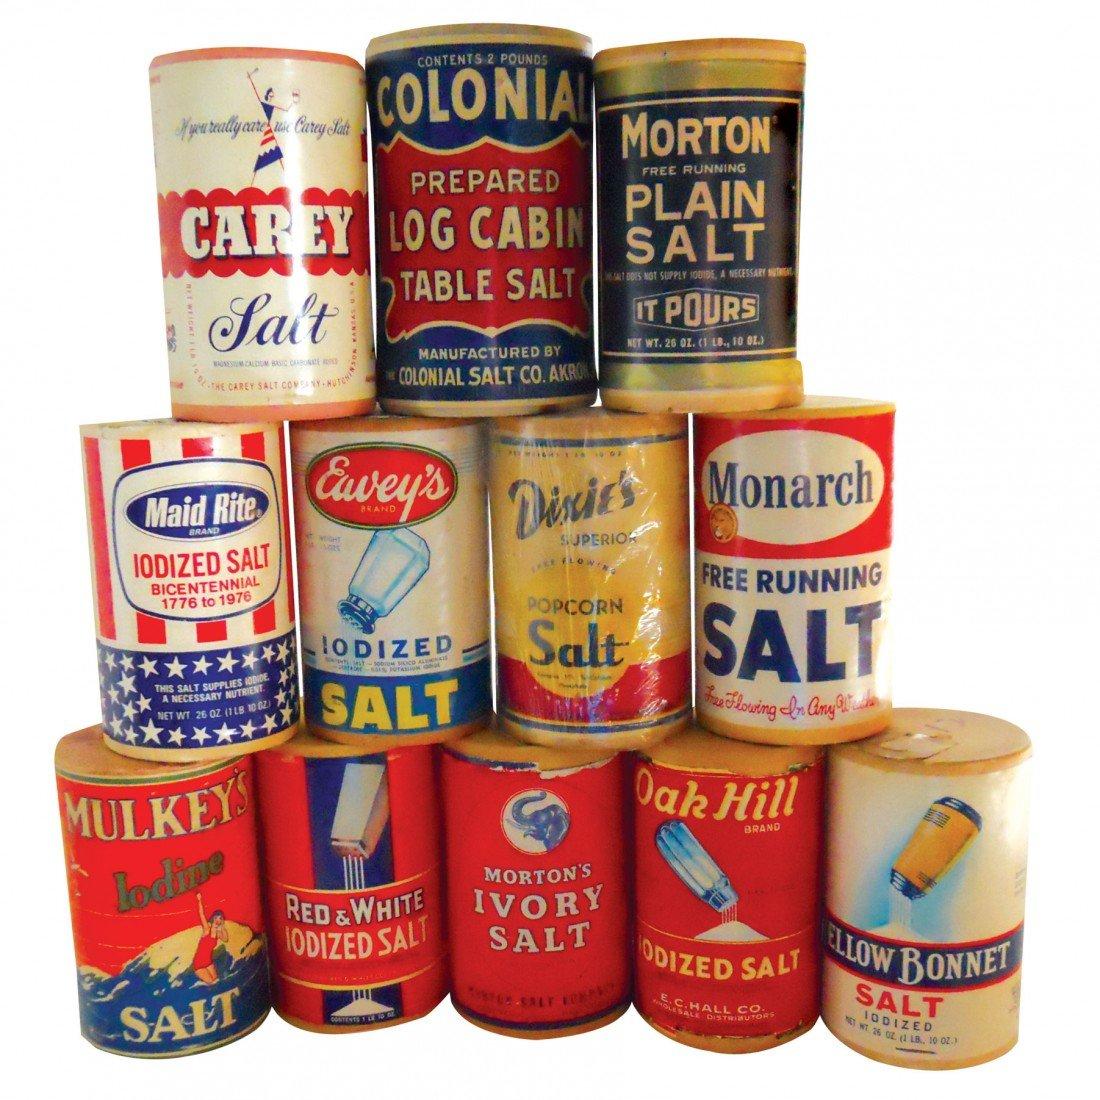 Popcorn salt & table salt containers (12), Carey, Colon